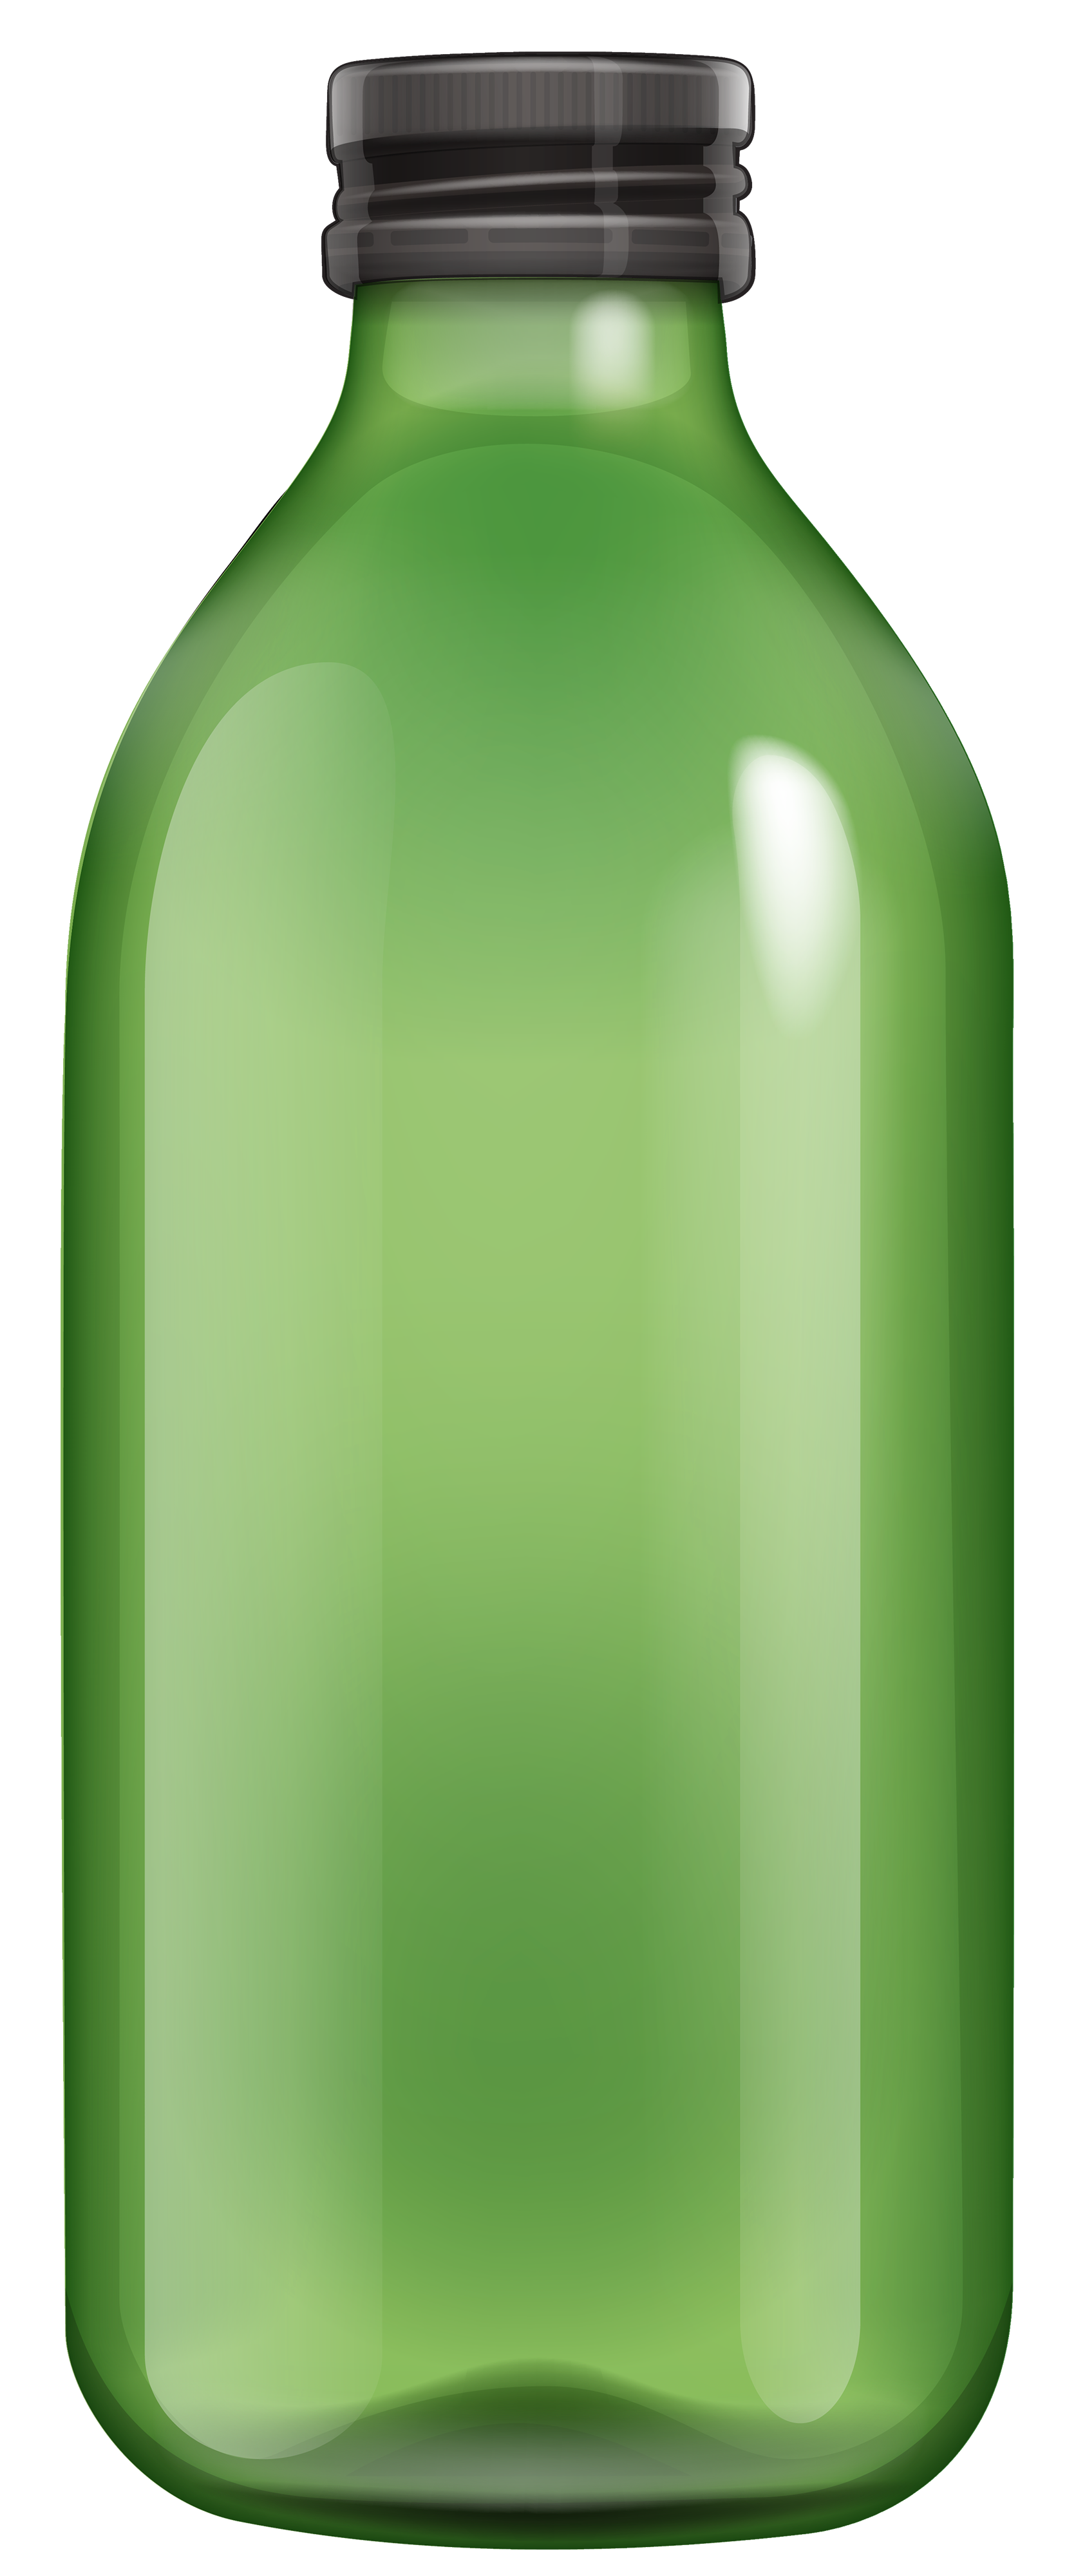 clip art transparent Green png best web. Bottle clipart